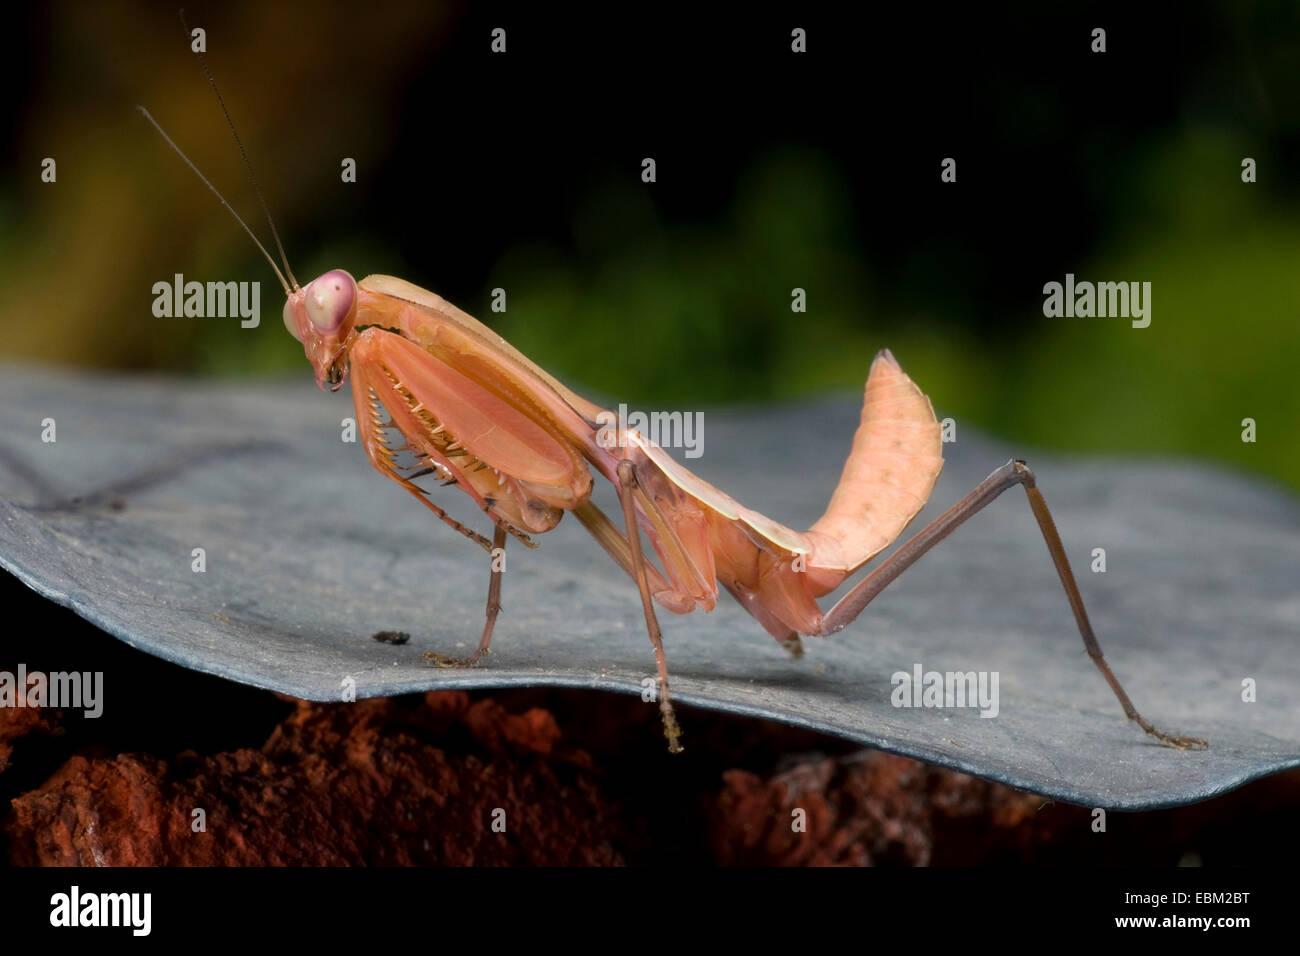 Giant Malaysian shield praying mantis (Rhombodera basalis), full length portrait Stock Photo